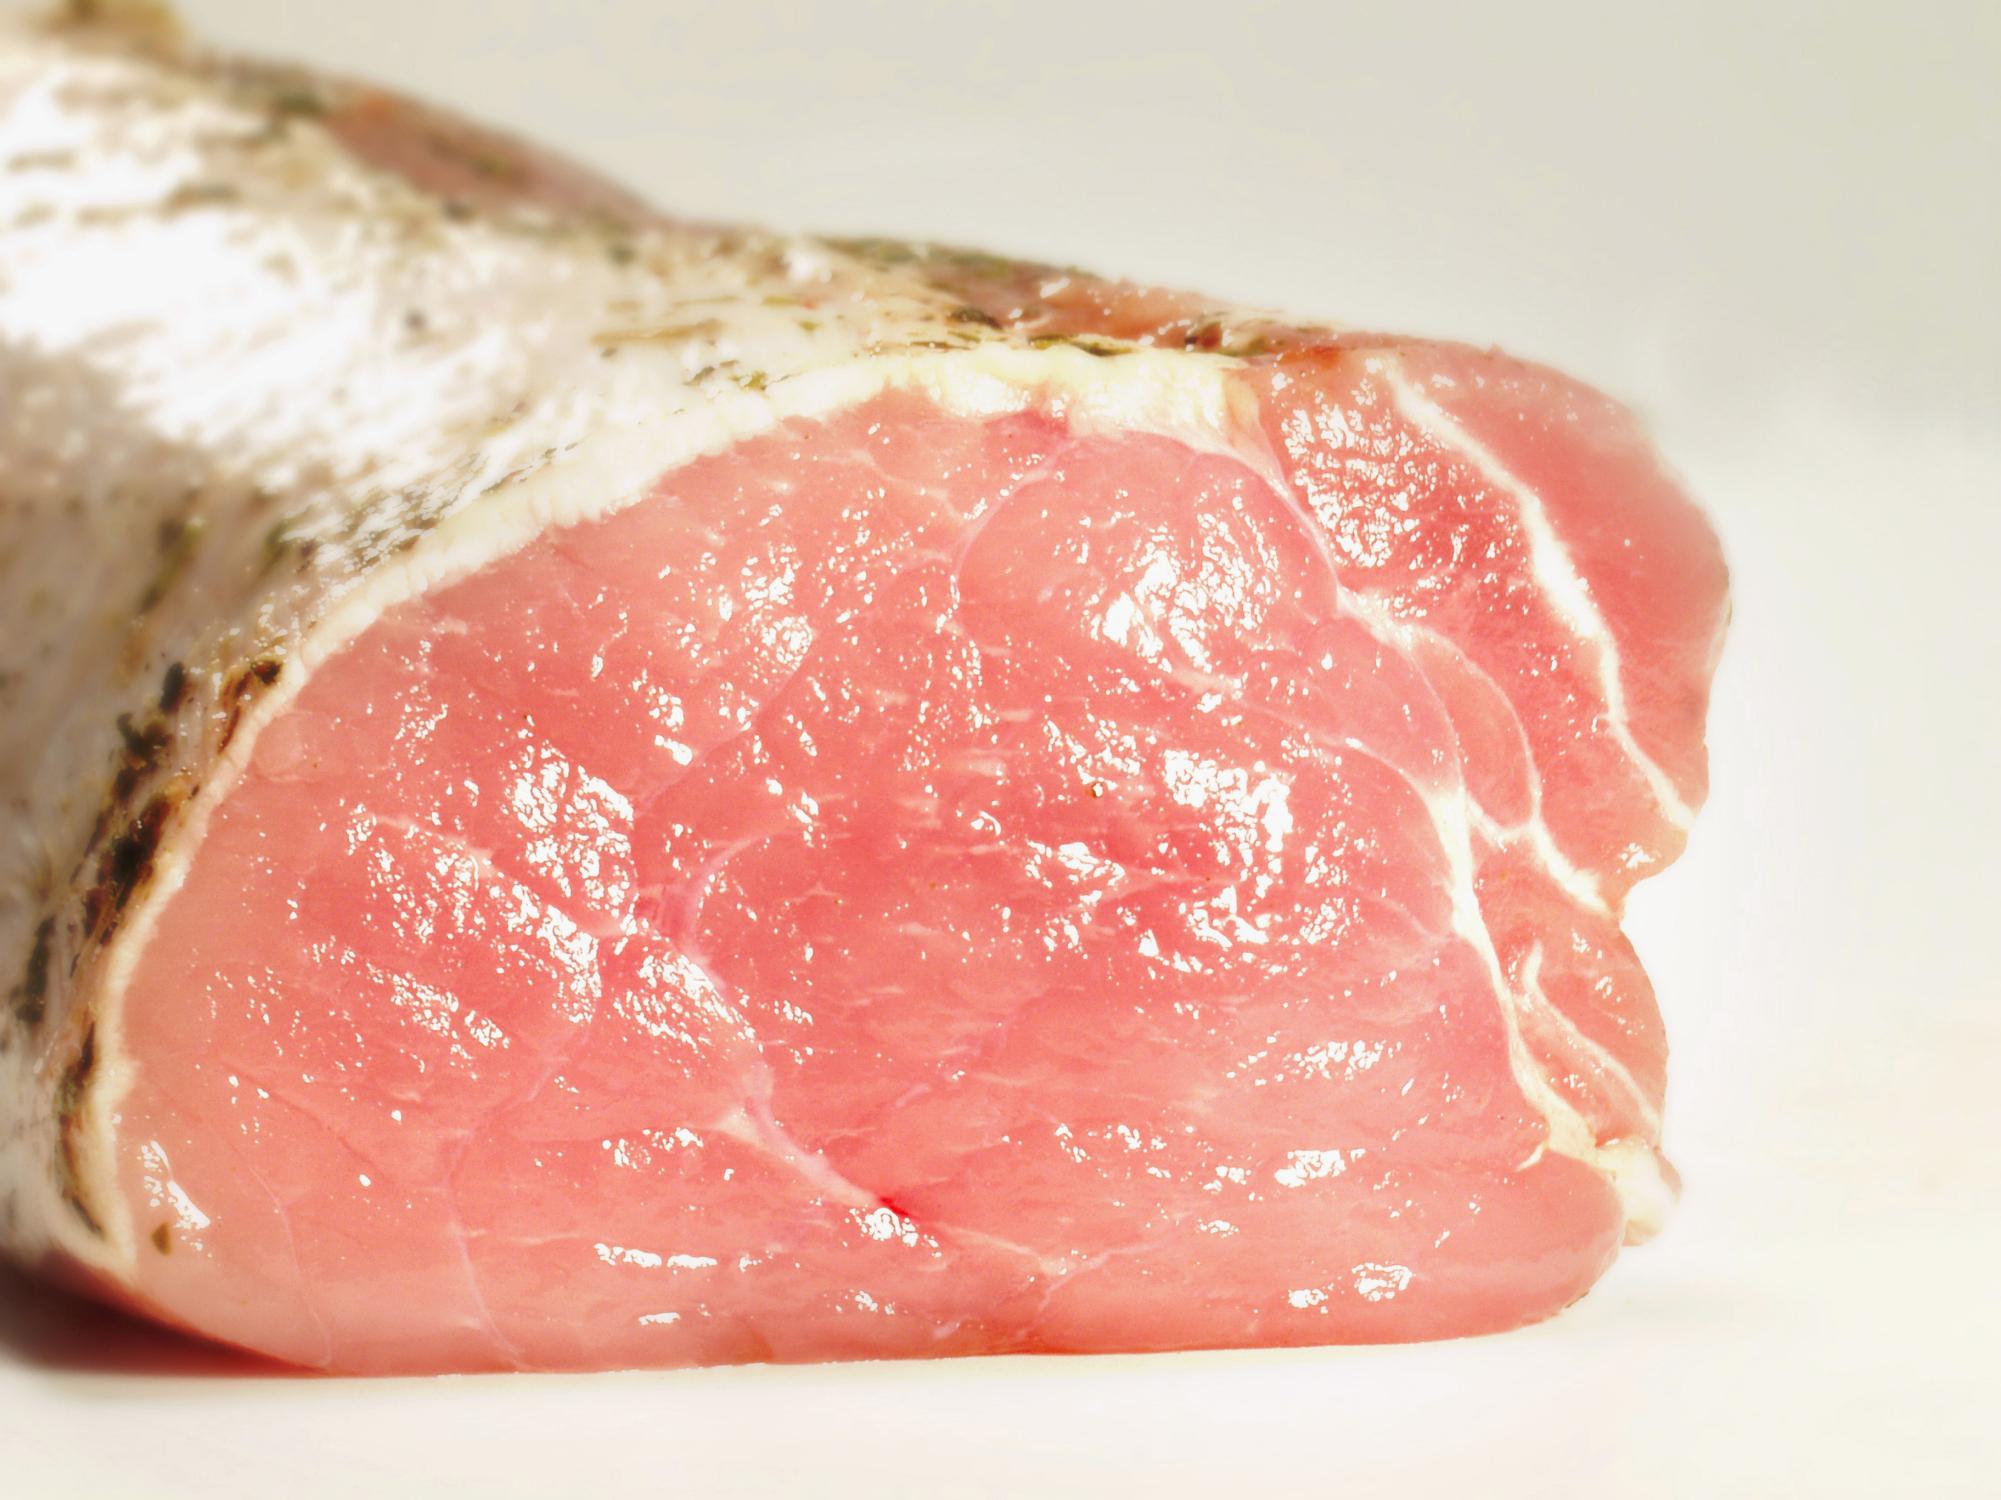 Meat is dangerous for pregnant women